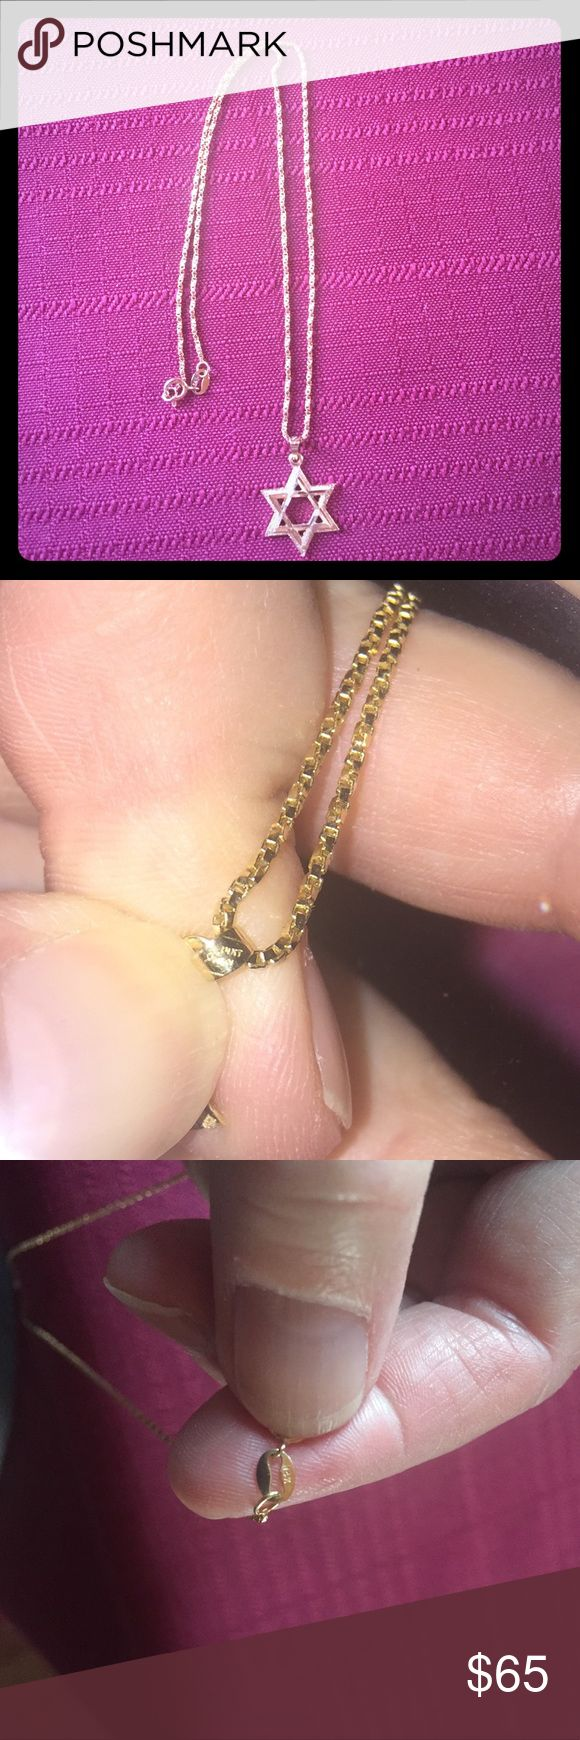 14 karat gold chain and Star of David pendant Beautiful 14 Karat gold box chain and 14 Karat gold Star of David pendant. Jewelry Necklaces